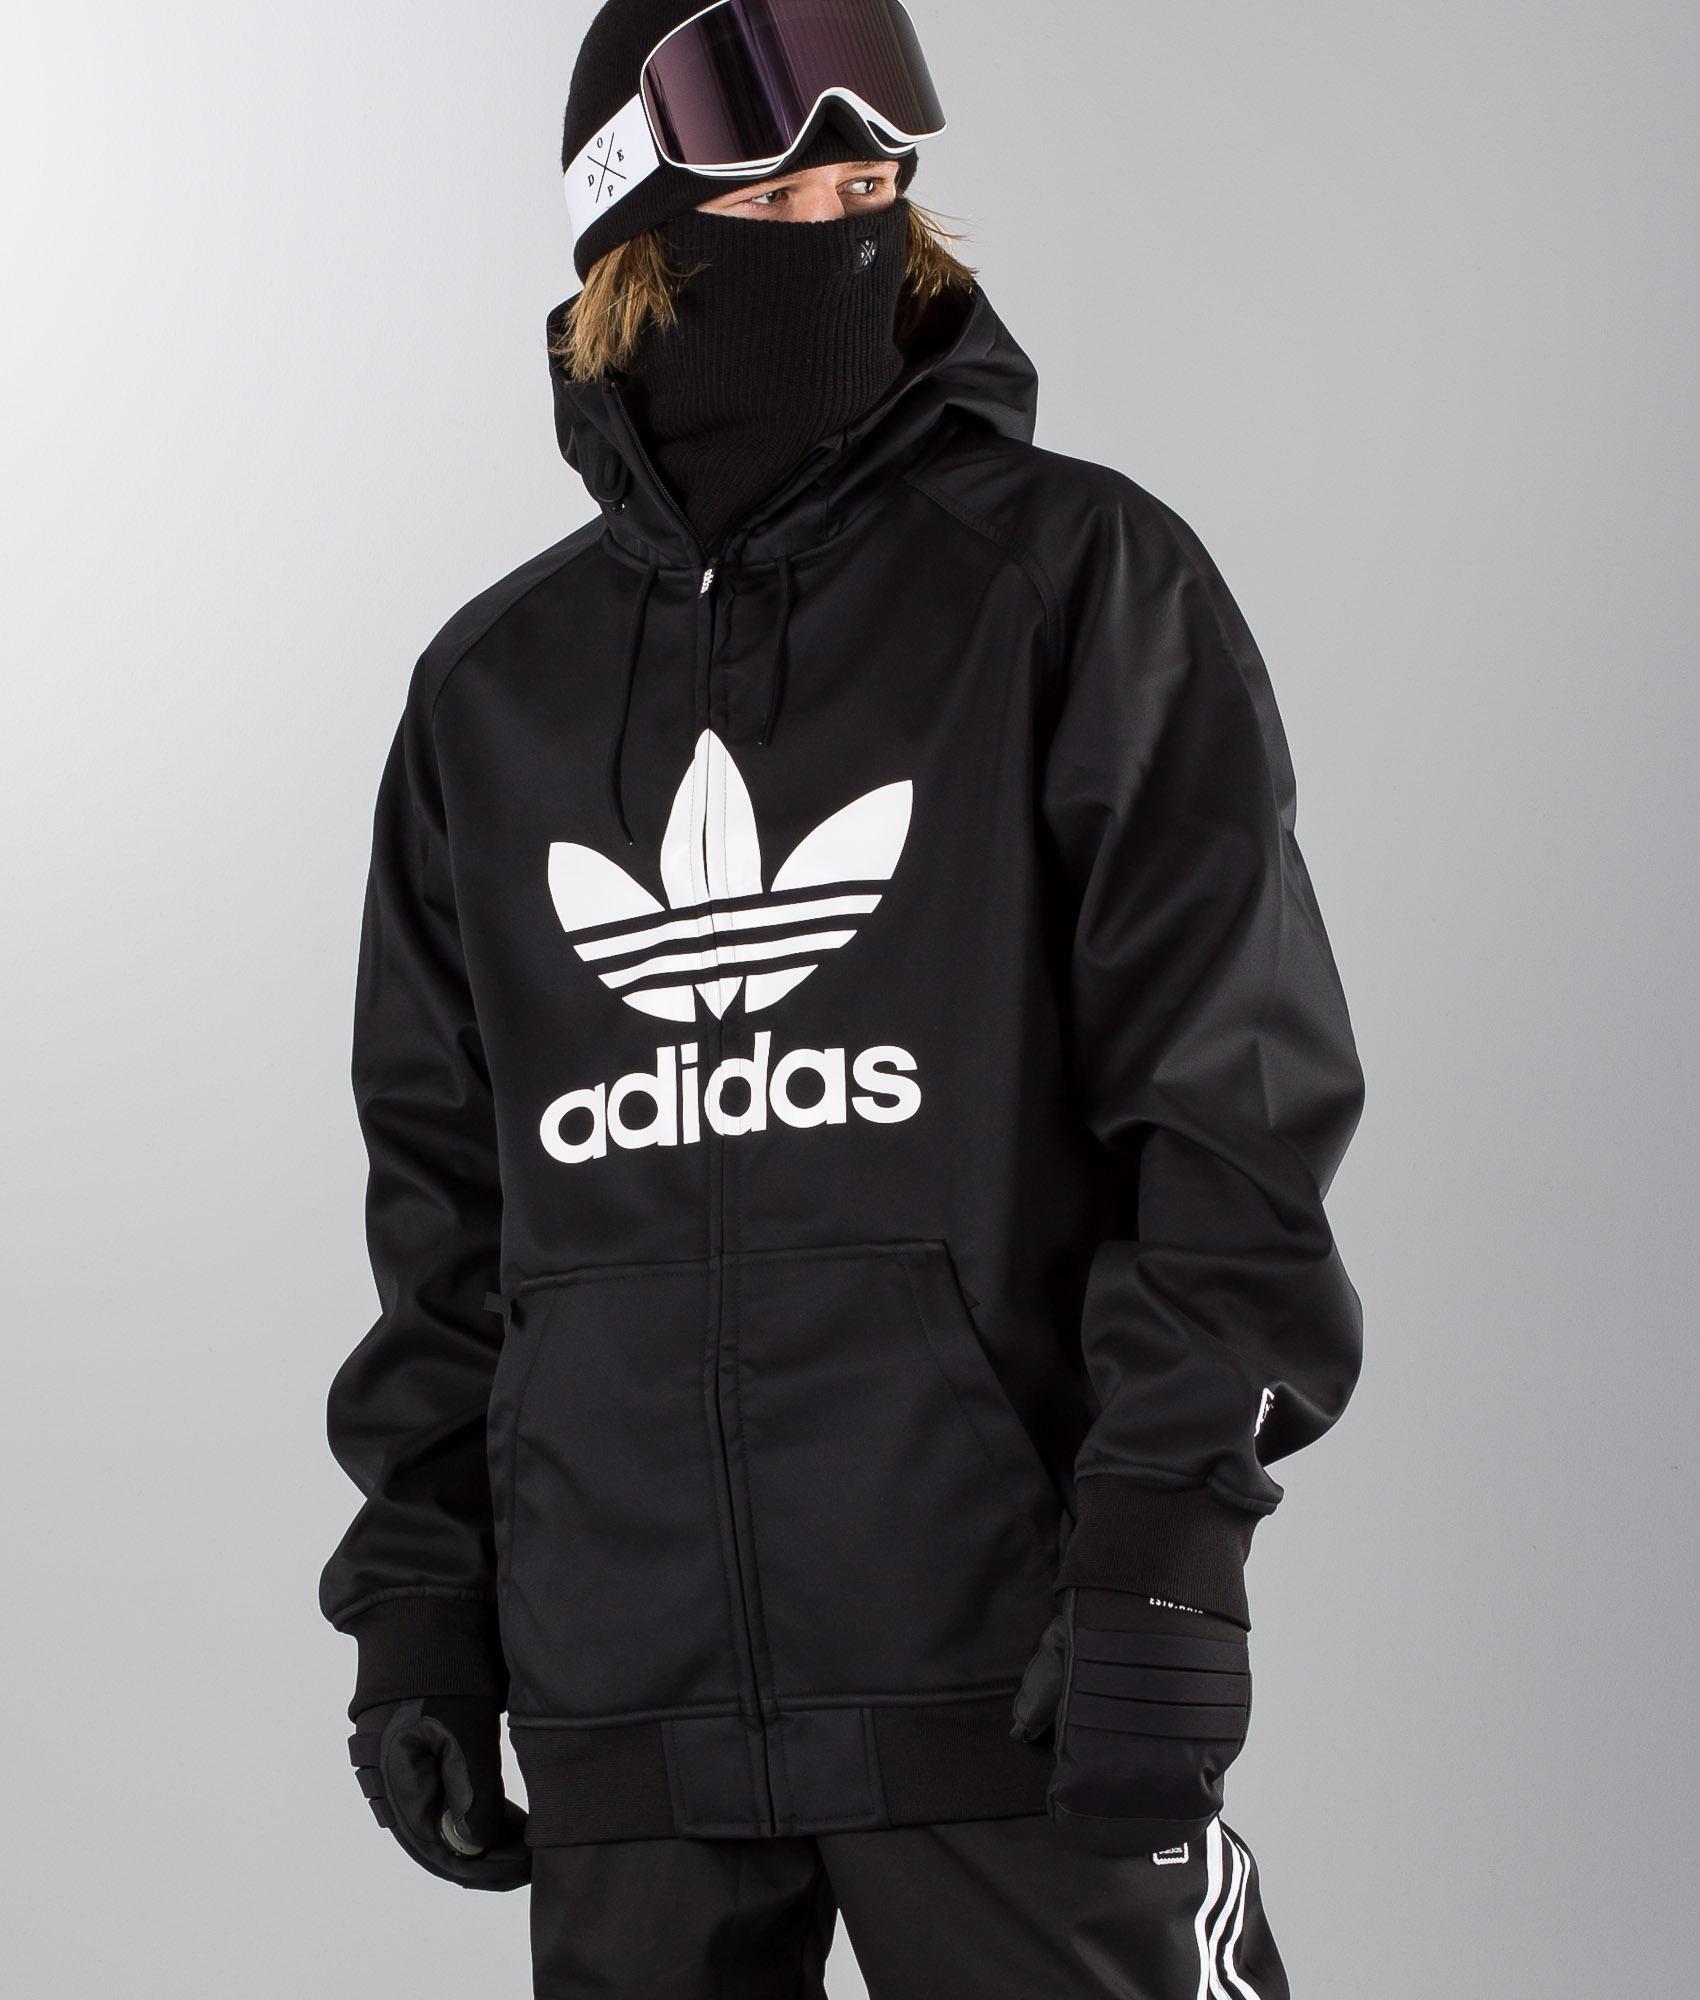 Adidas Snowboarding Greeley Snowboardjacka BlackWhite